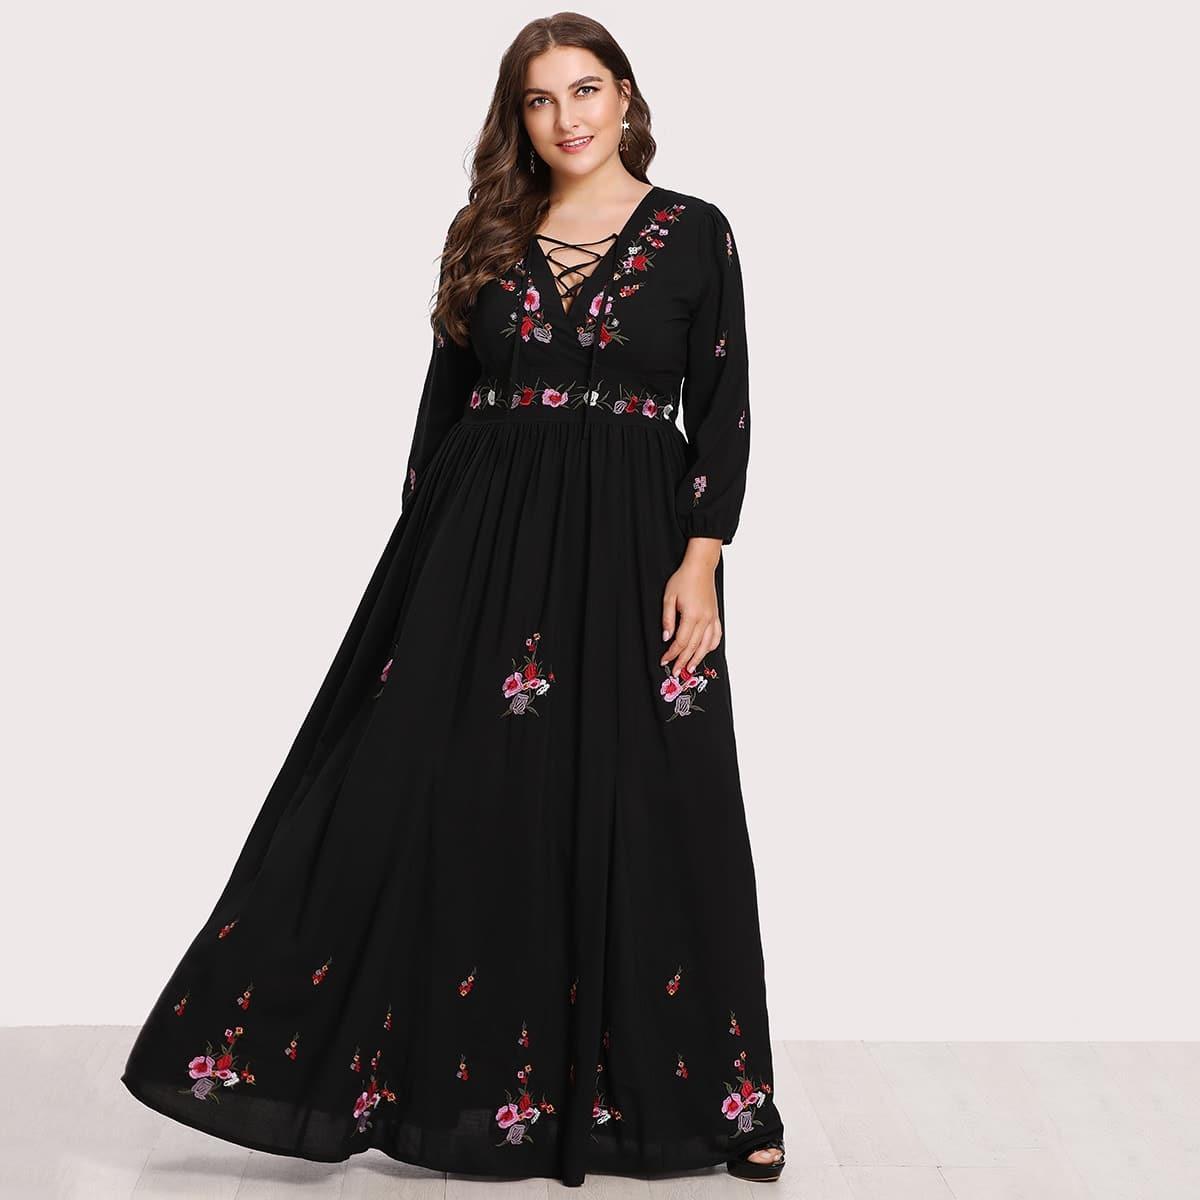 Maxi jurk met bloemenprint en lace-up